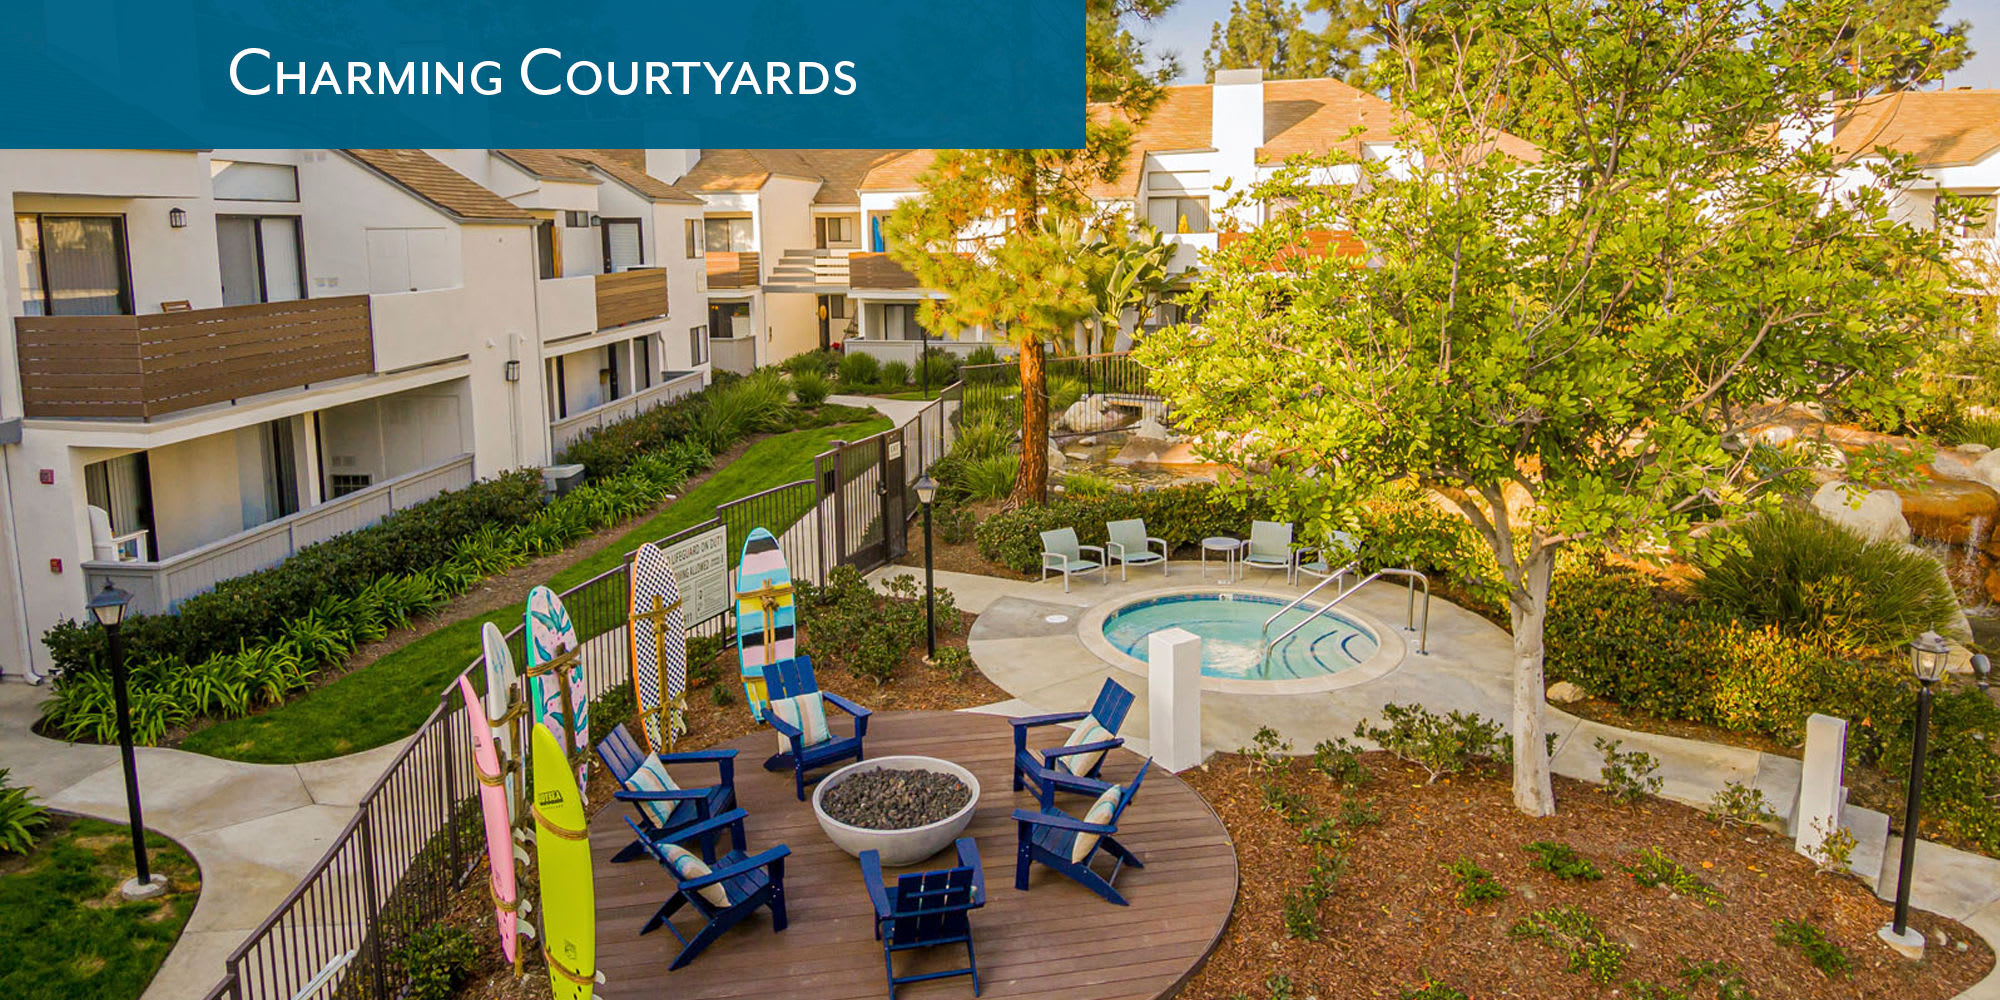 Charming courtyards at Sendero Huntington Beach in Huntington Beach, California